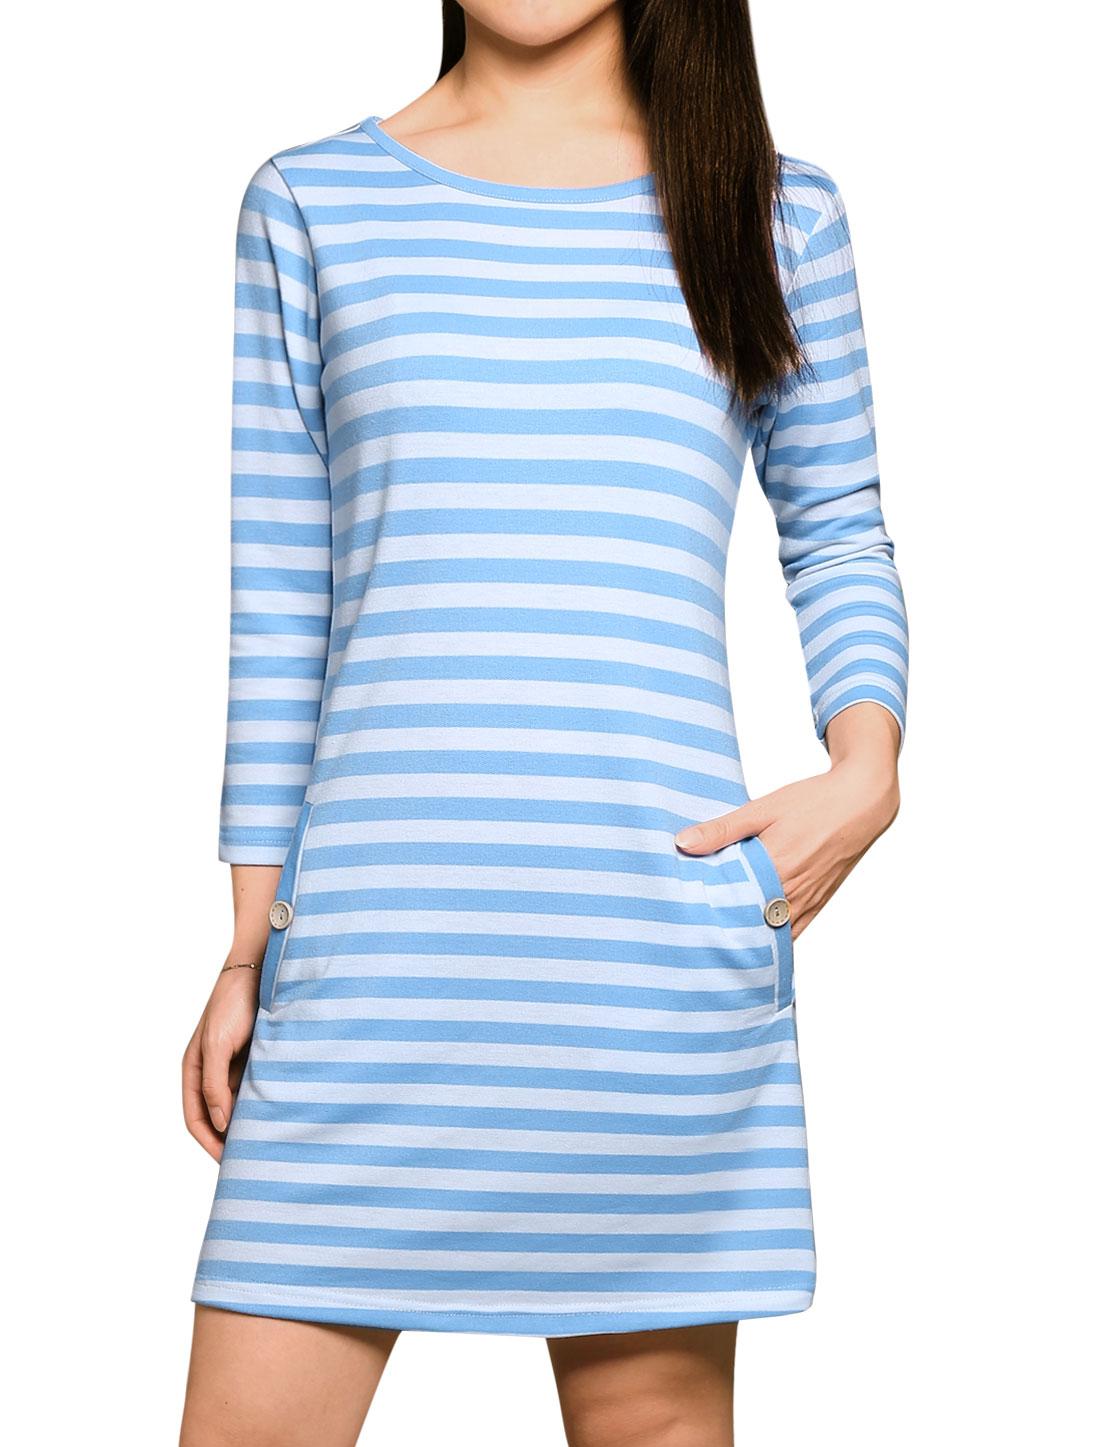 Woman Bar Striped 3/4 Sleeves Scoop Neck Unlined Mini Dress Blue S